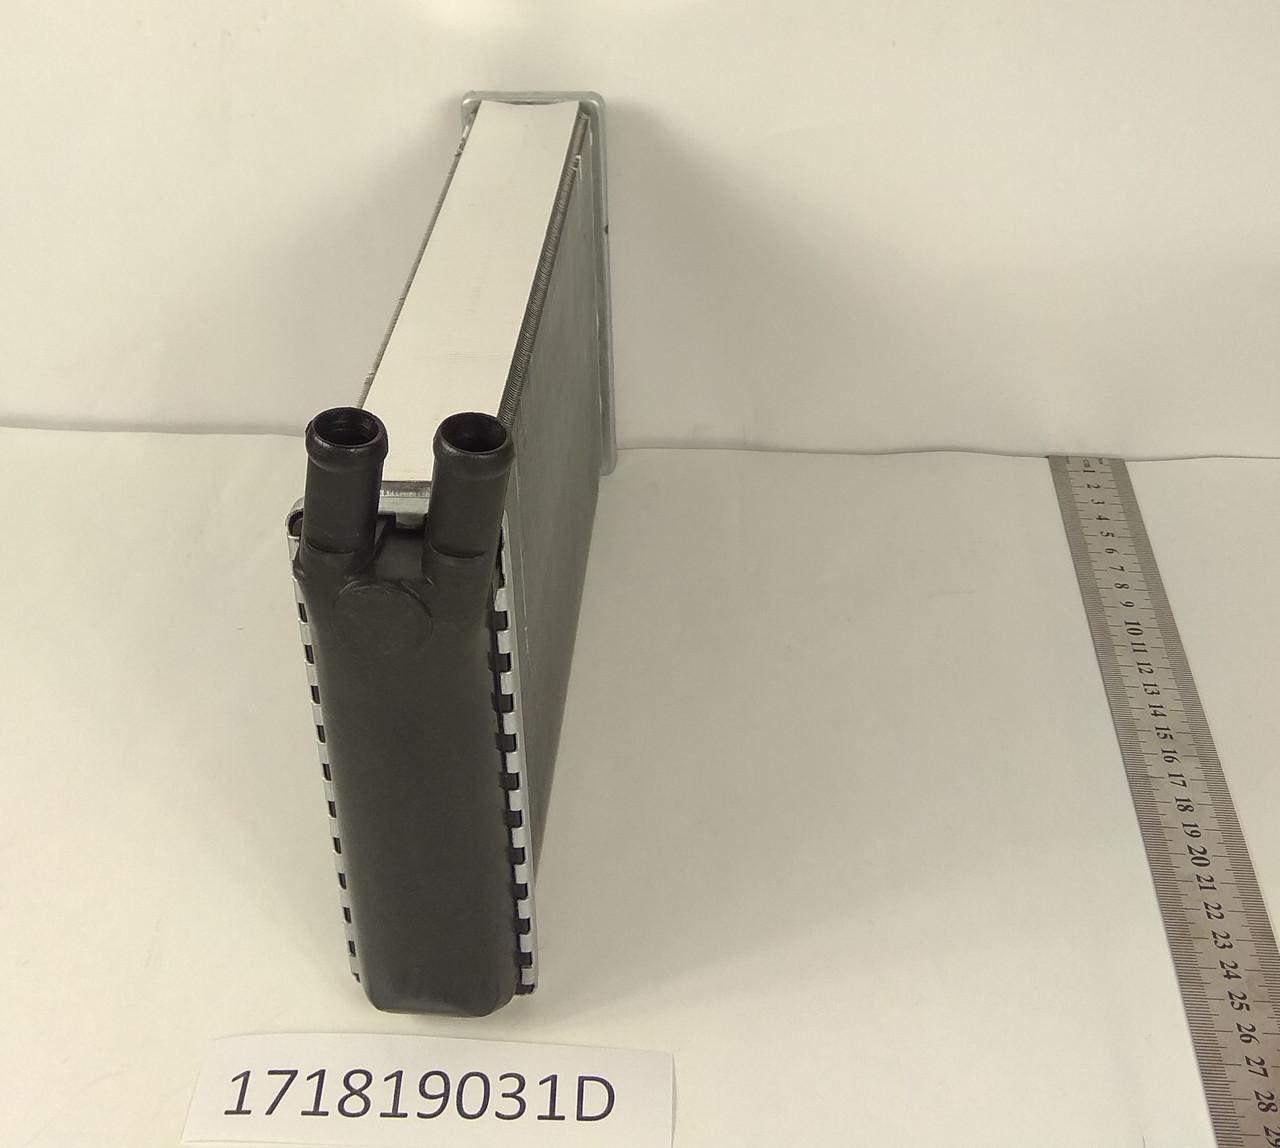 Радиатор печки Volswagen Passat 1973-1997 (234*157мм по сотах) KEMP